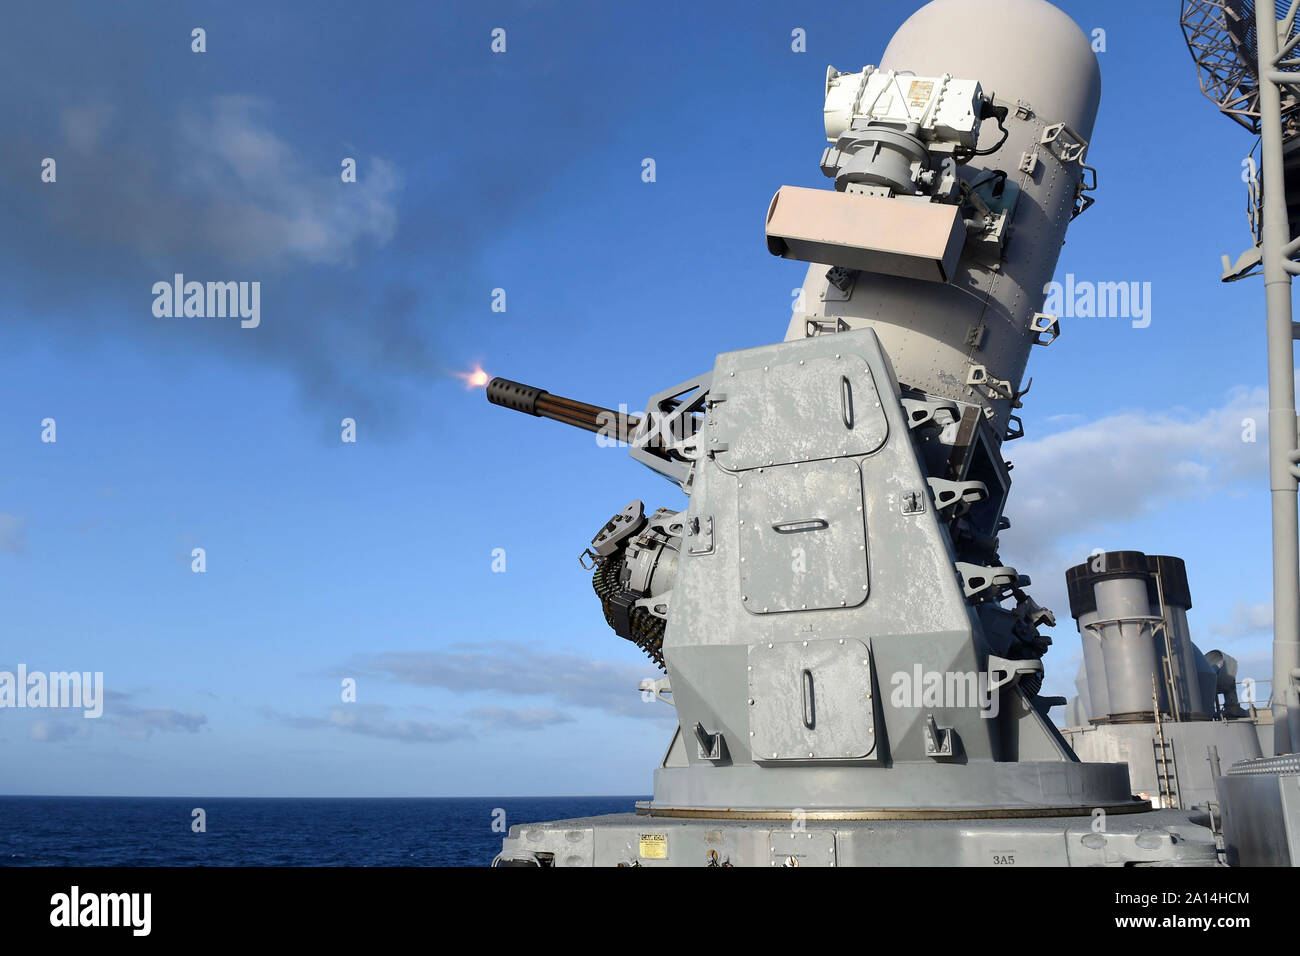 El cierre de sistema seapon incendios rondas de 20mm a bordo del USS Vicksburg. Foto de stock